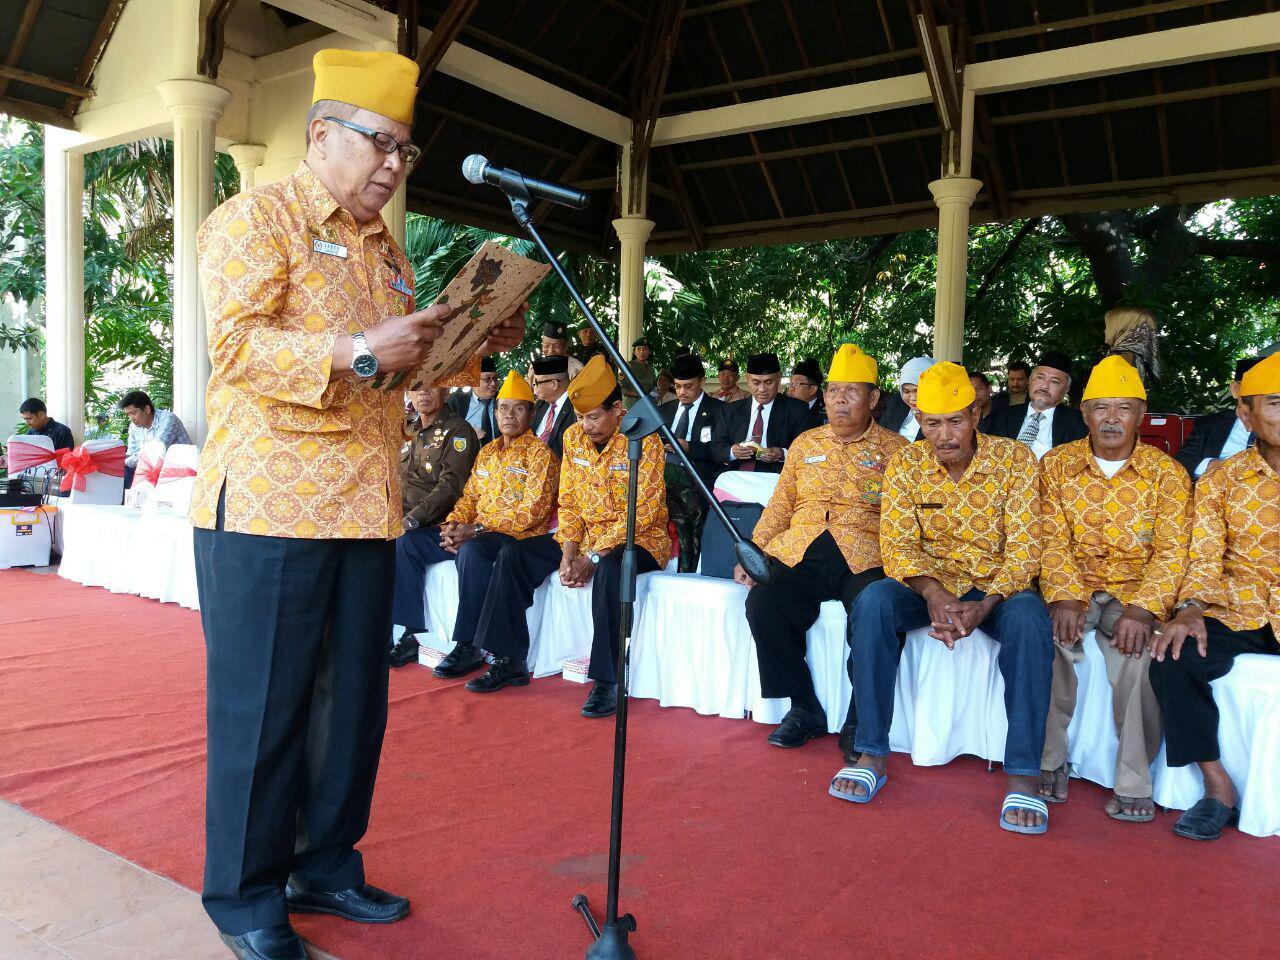 Upacara Peringatan Hari Korban 40 000 Jiwa 71 Sulawesi Selatan